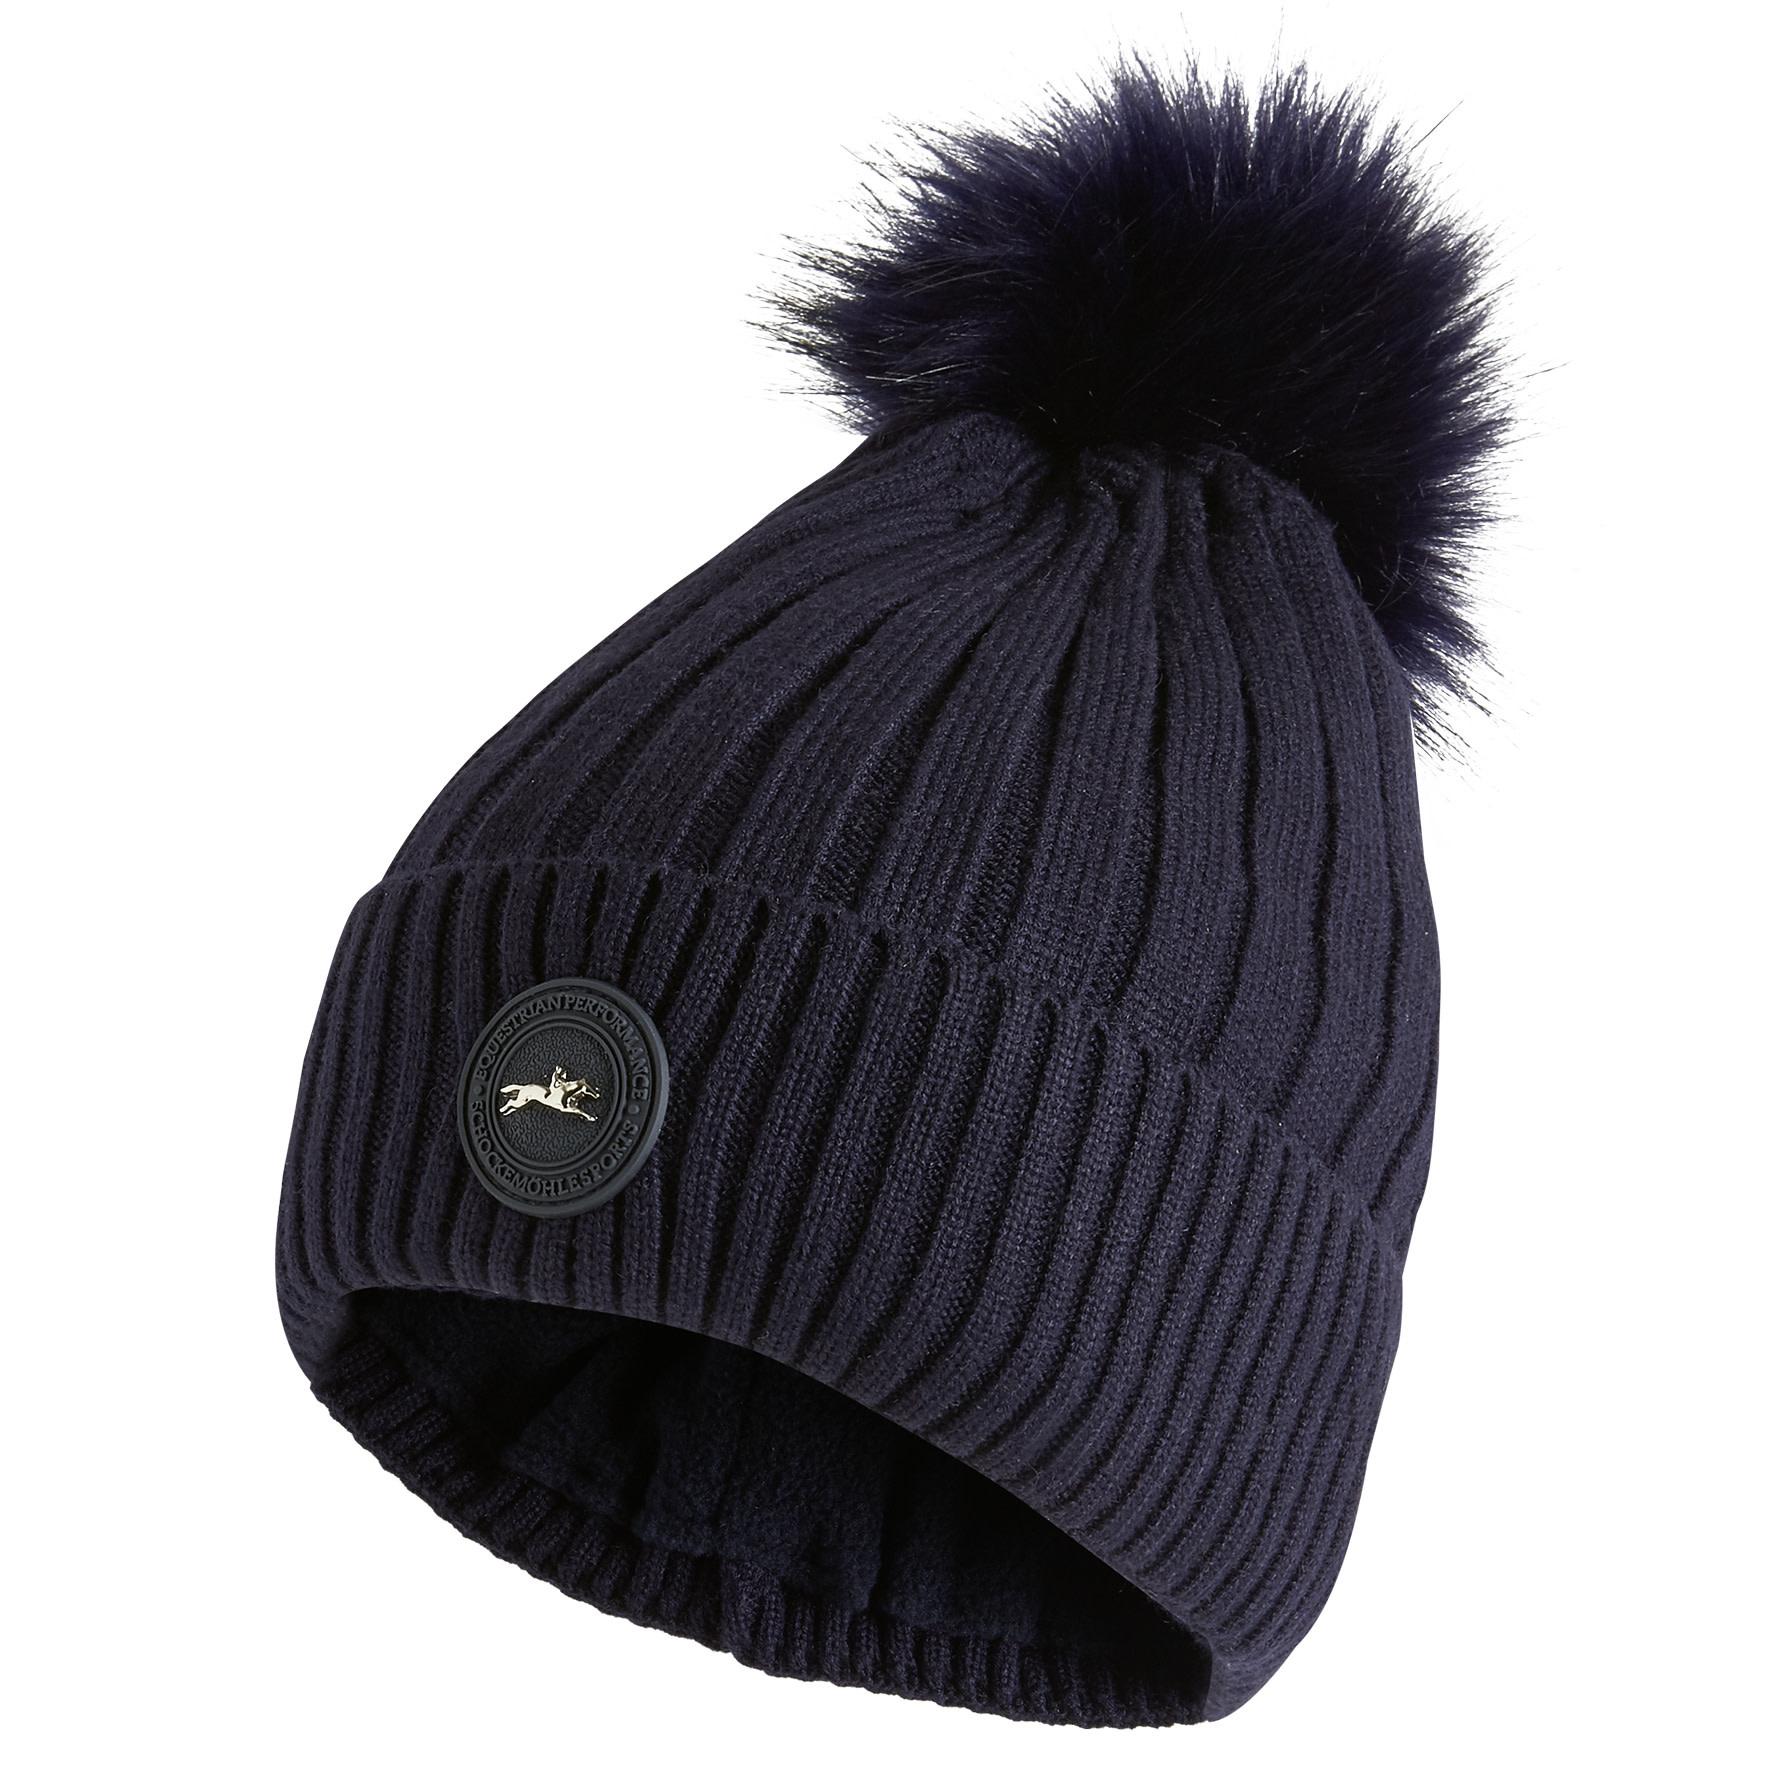 Schockemohle Schockemohle Baila Beanie Style Winter Hat